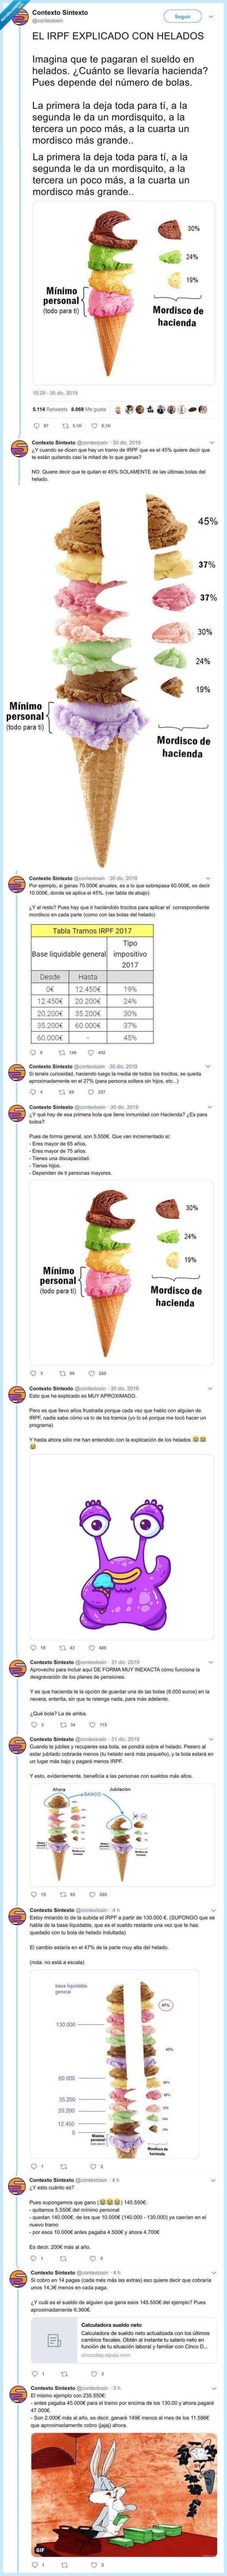 helados,irpf,tramos